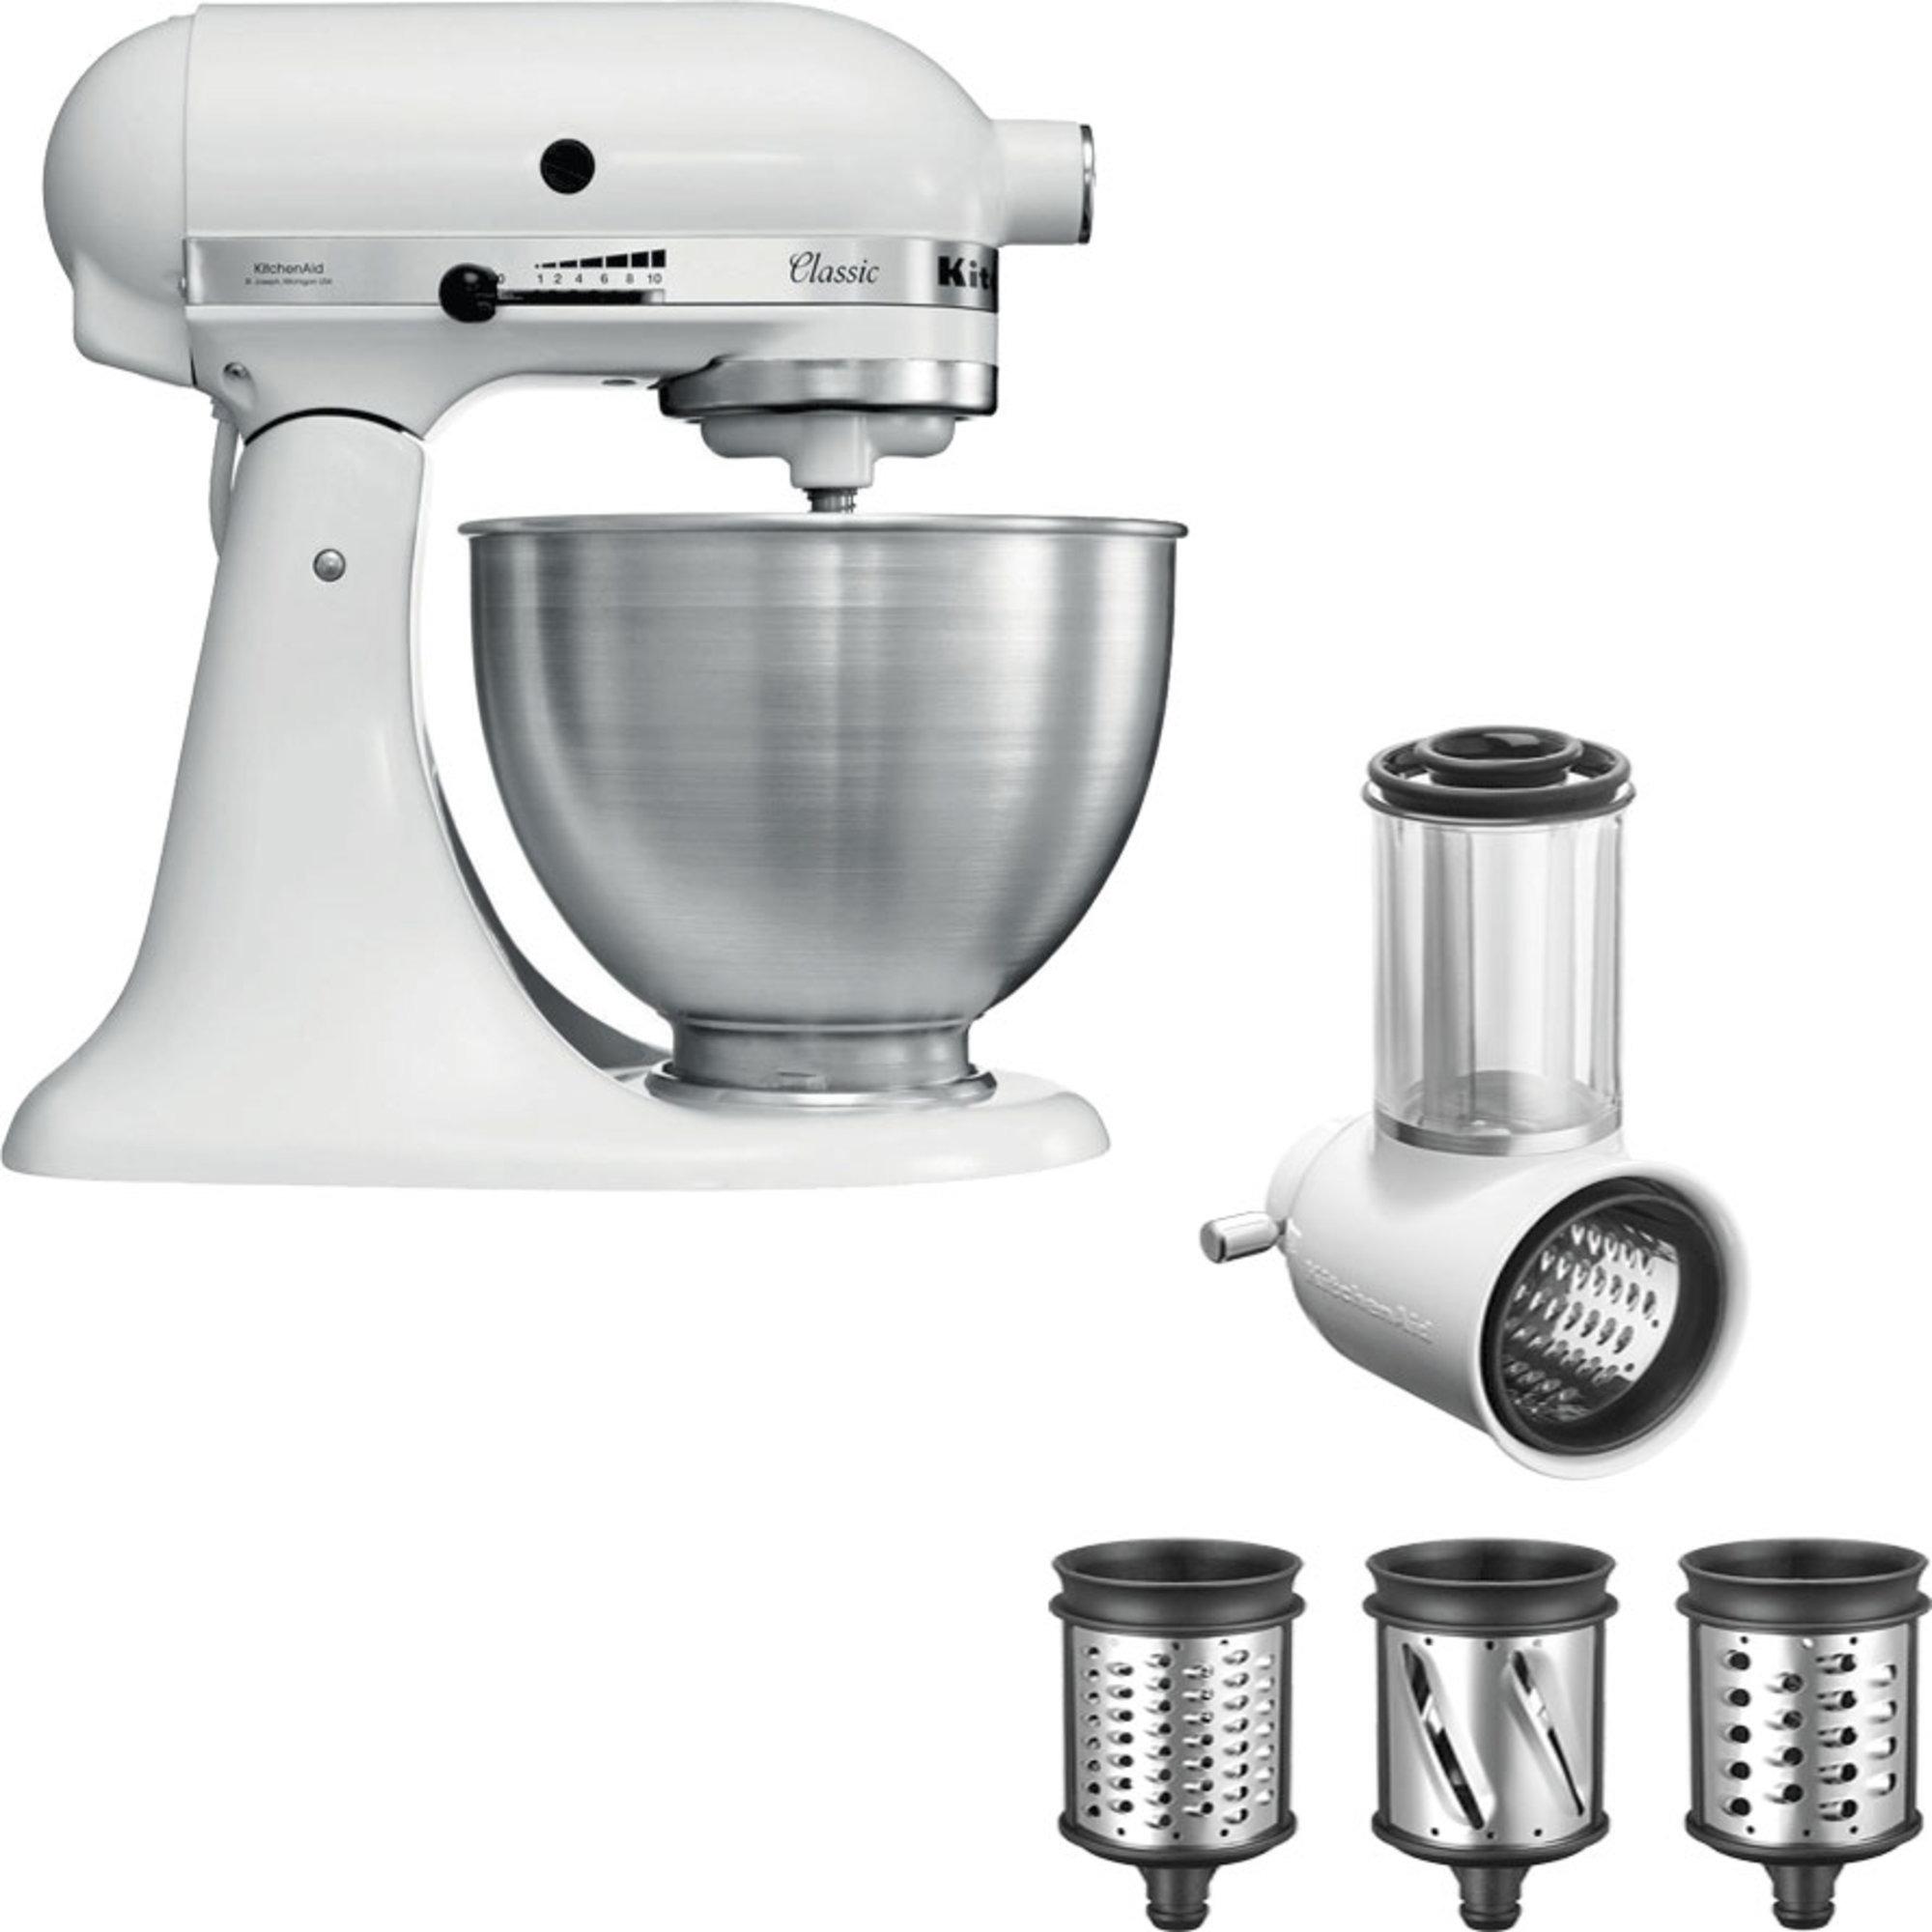 KitchenAid Classic Köksmaskin + Grönsaksskärare